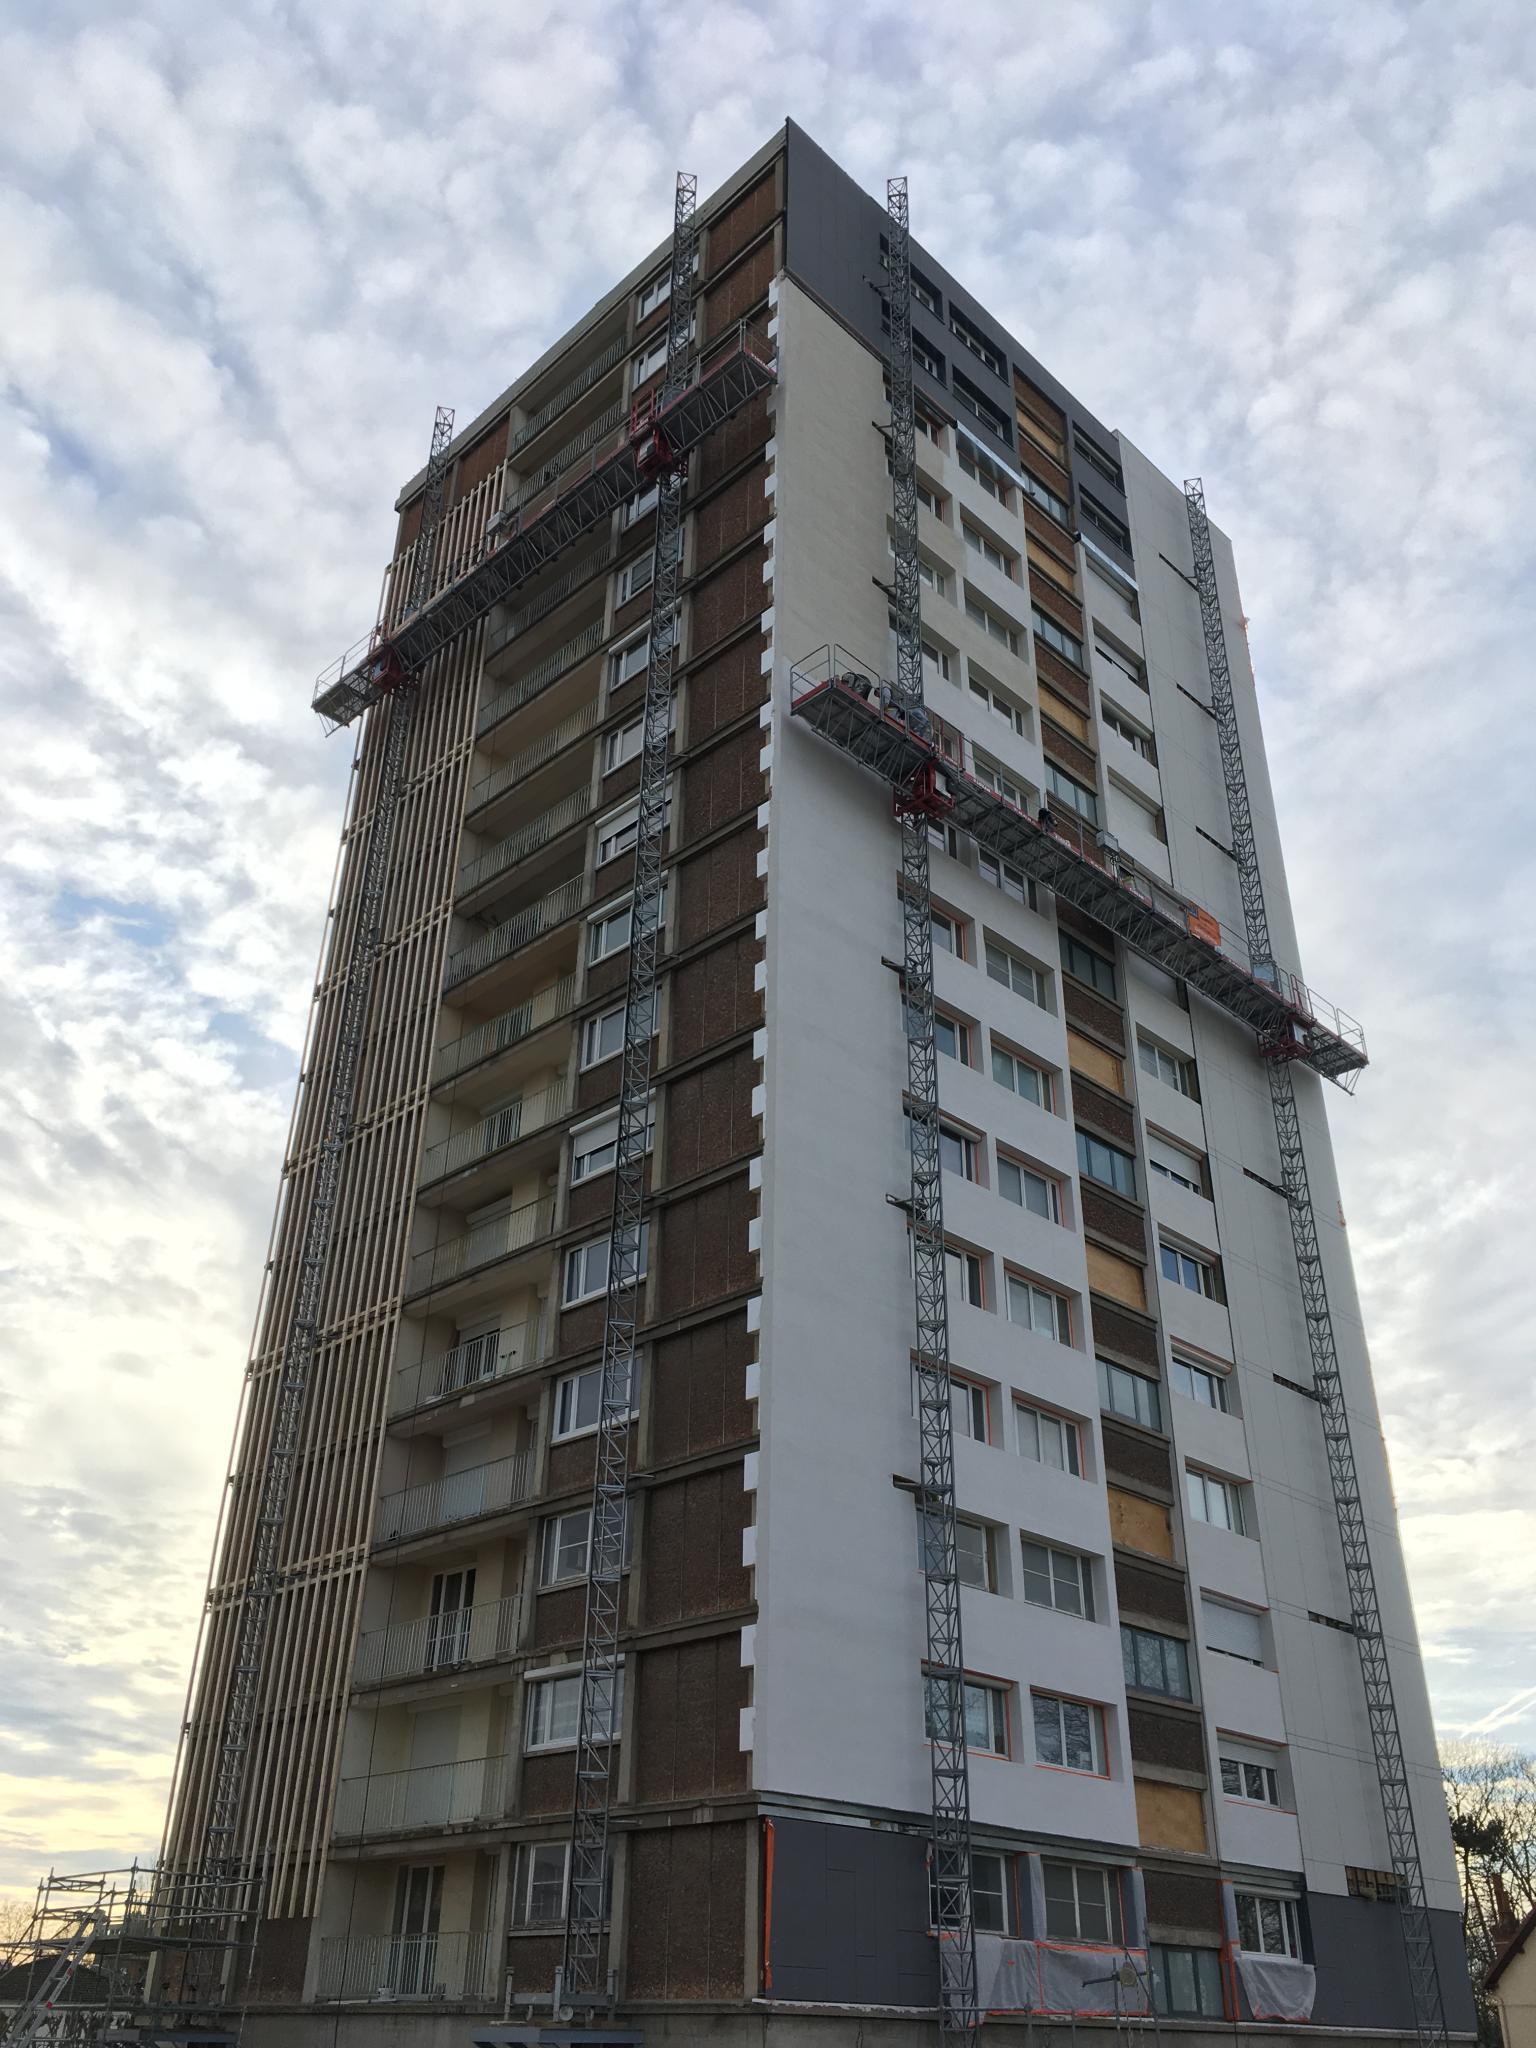 Image d'aperçu du projet